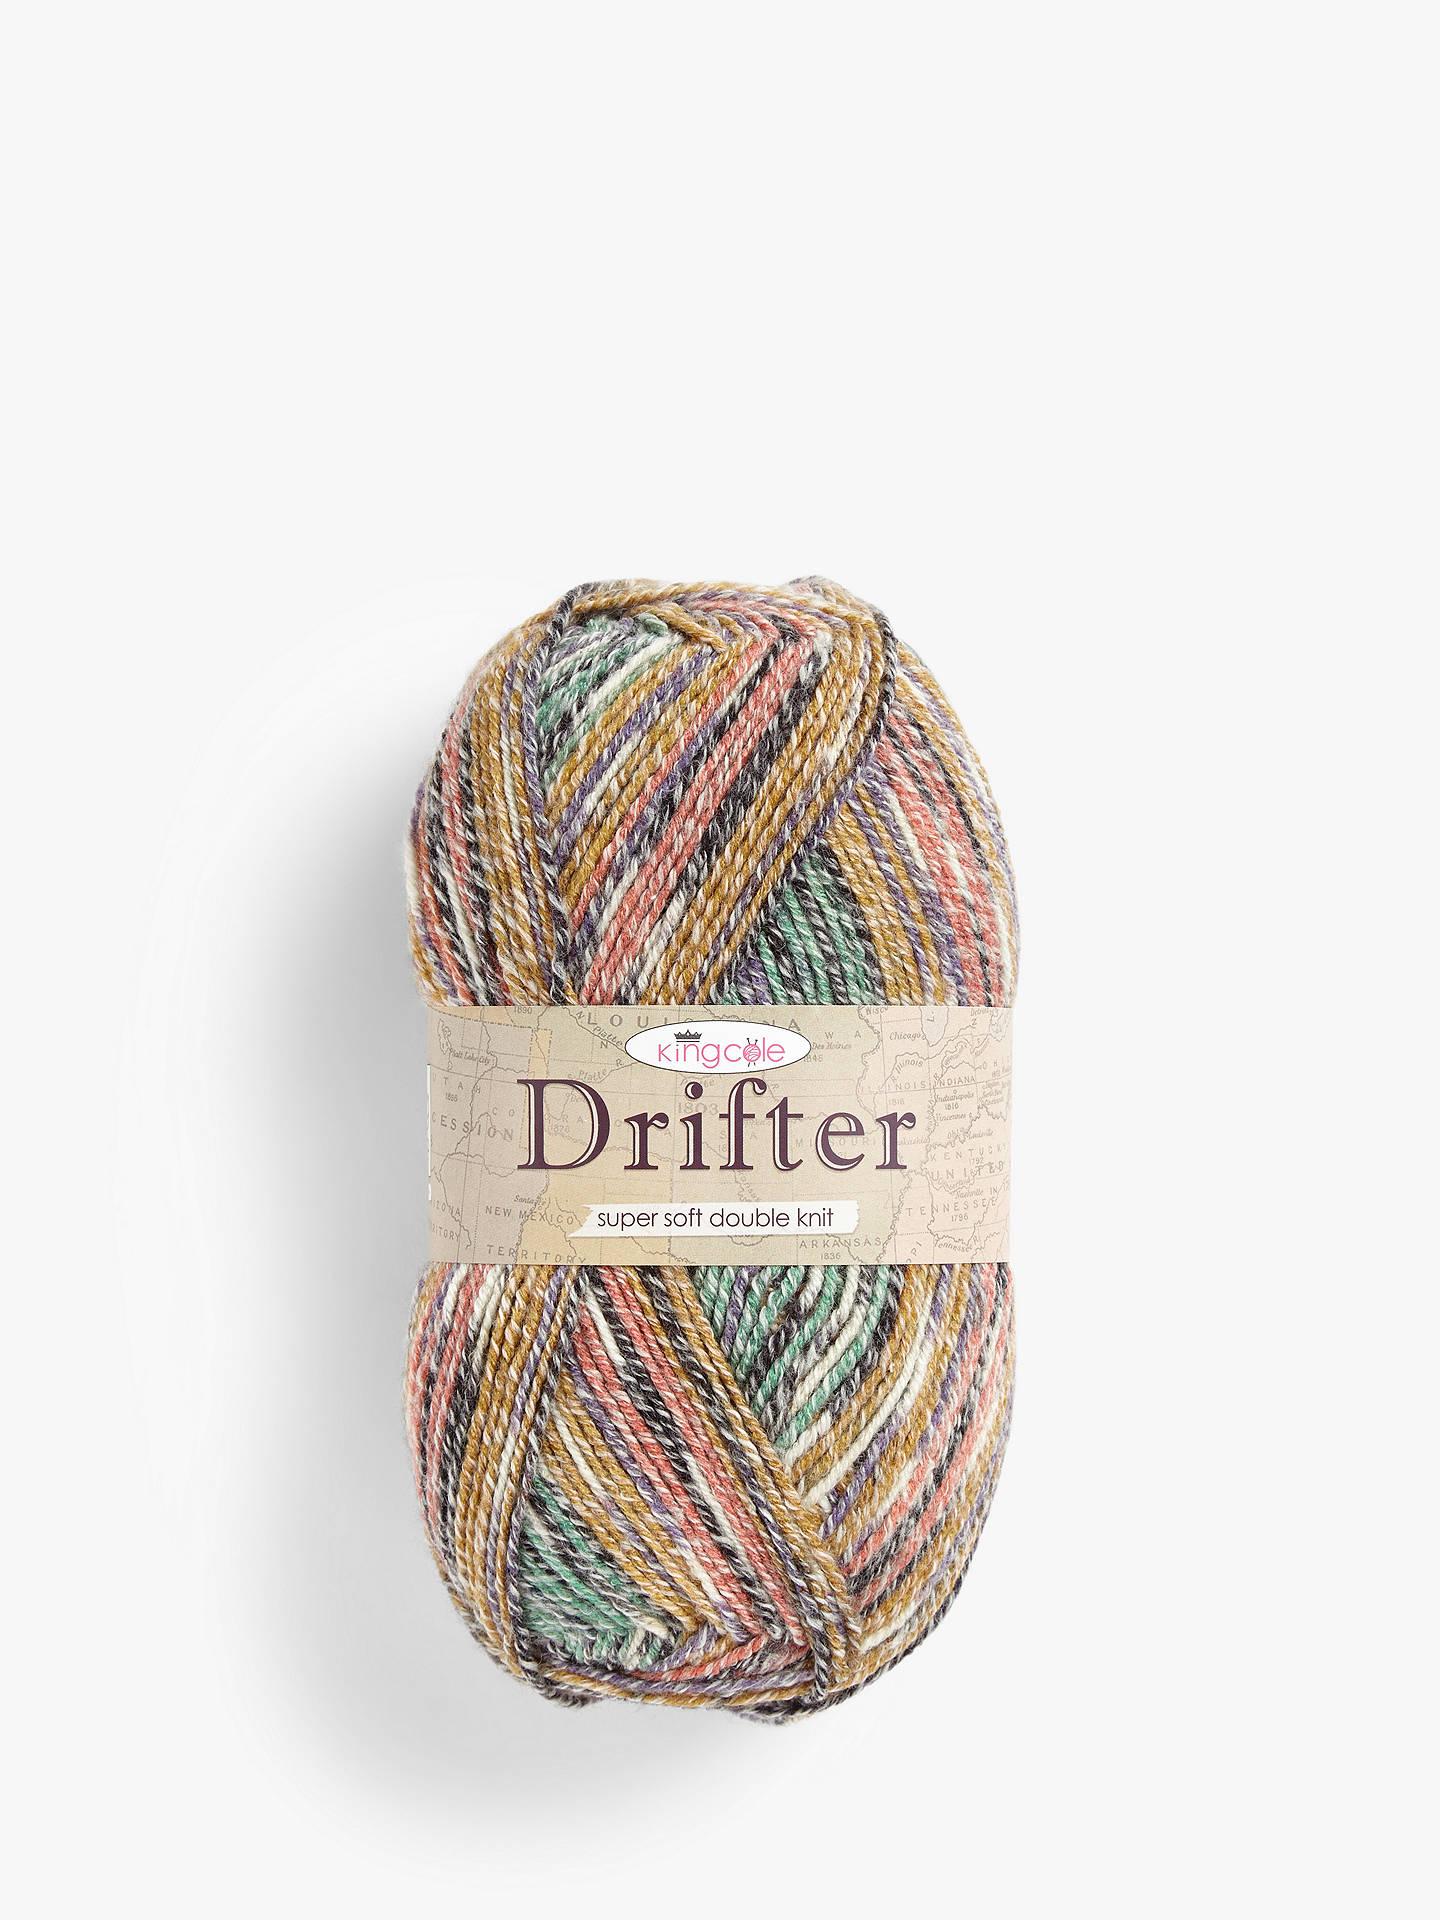 Many Colours Self Striping Yarn 100g Drifter DK Knitting Yarn by King Cole